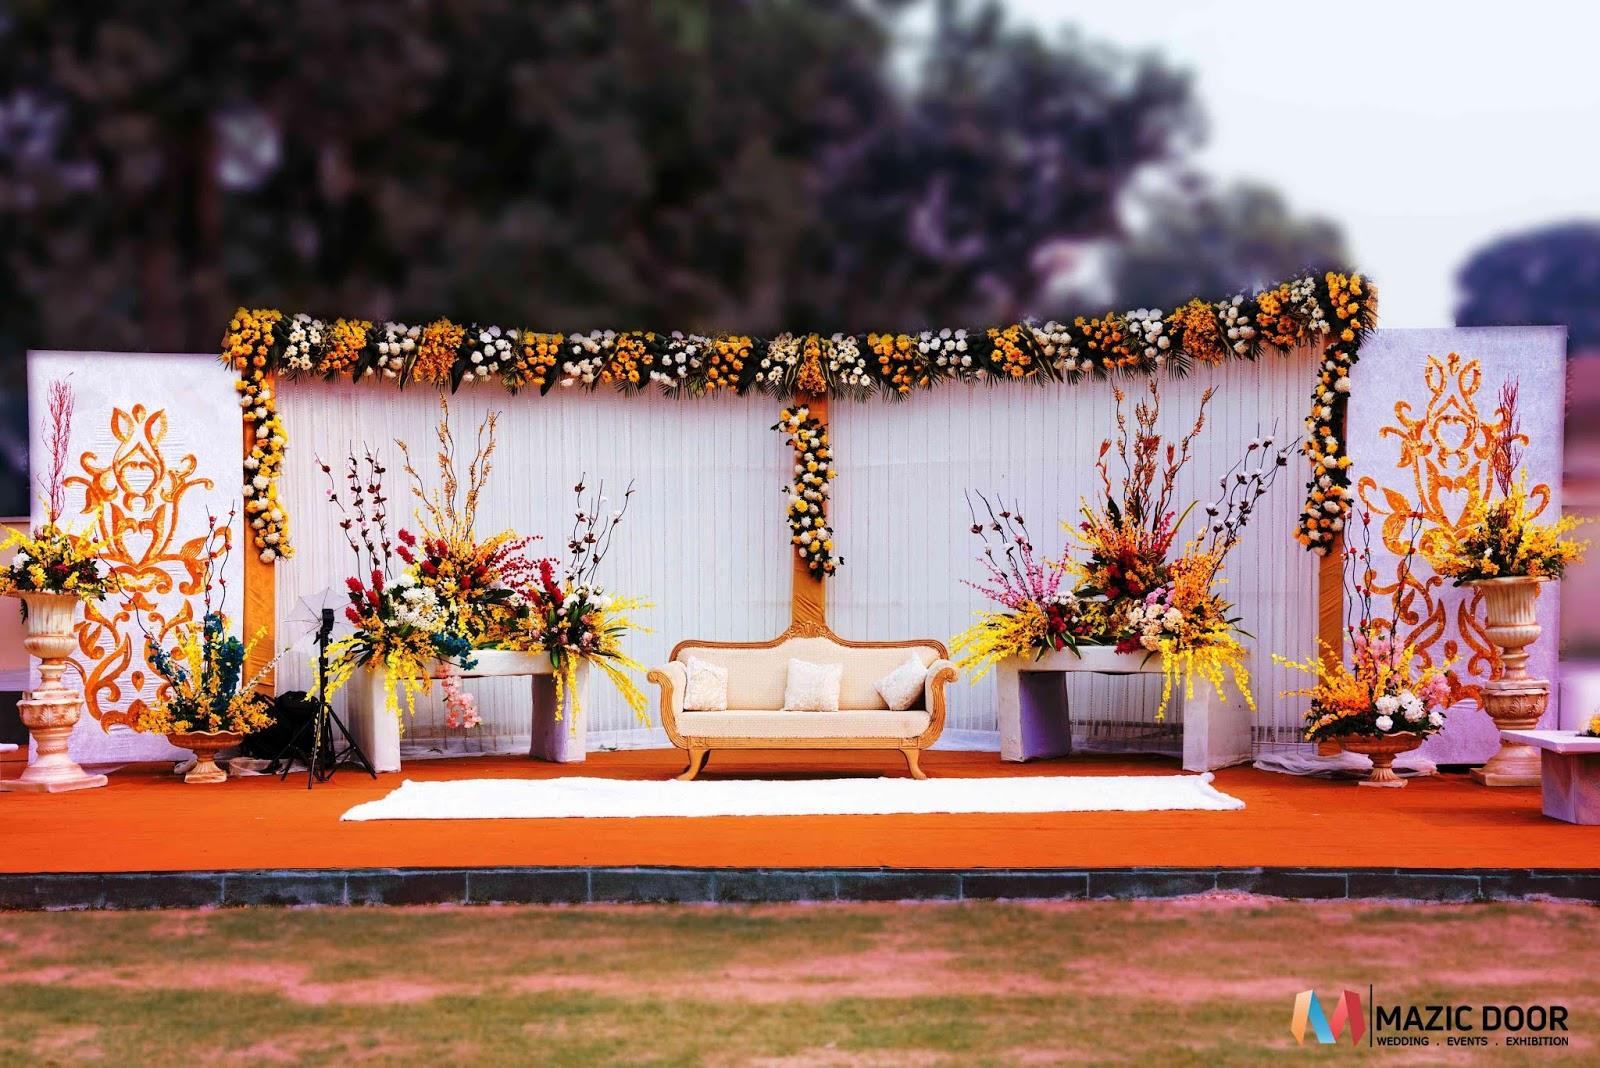 The Grand Wedding Stage Design In Guwahati Designed By Mazic Door